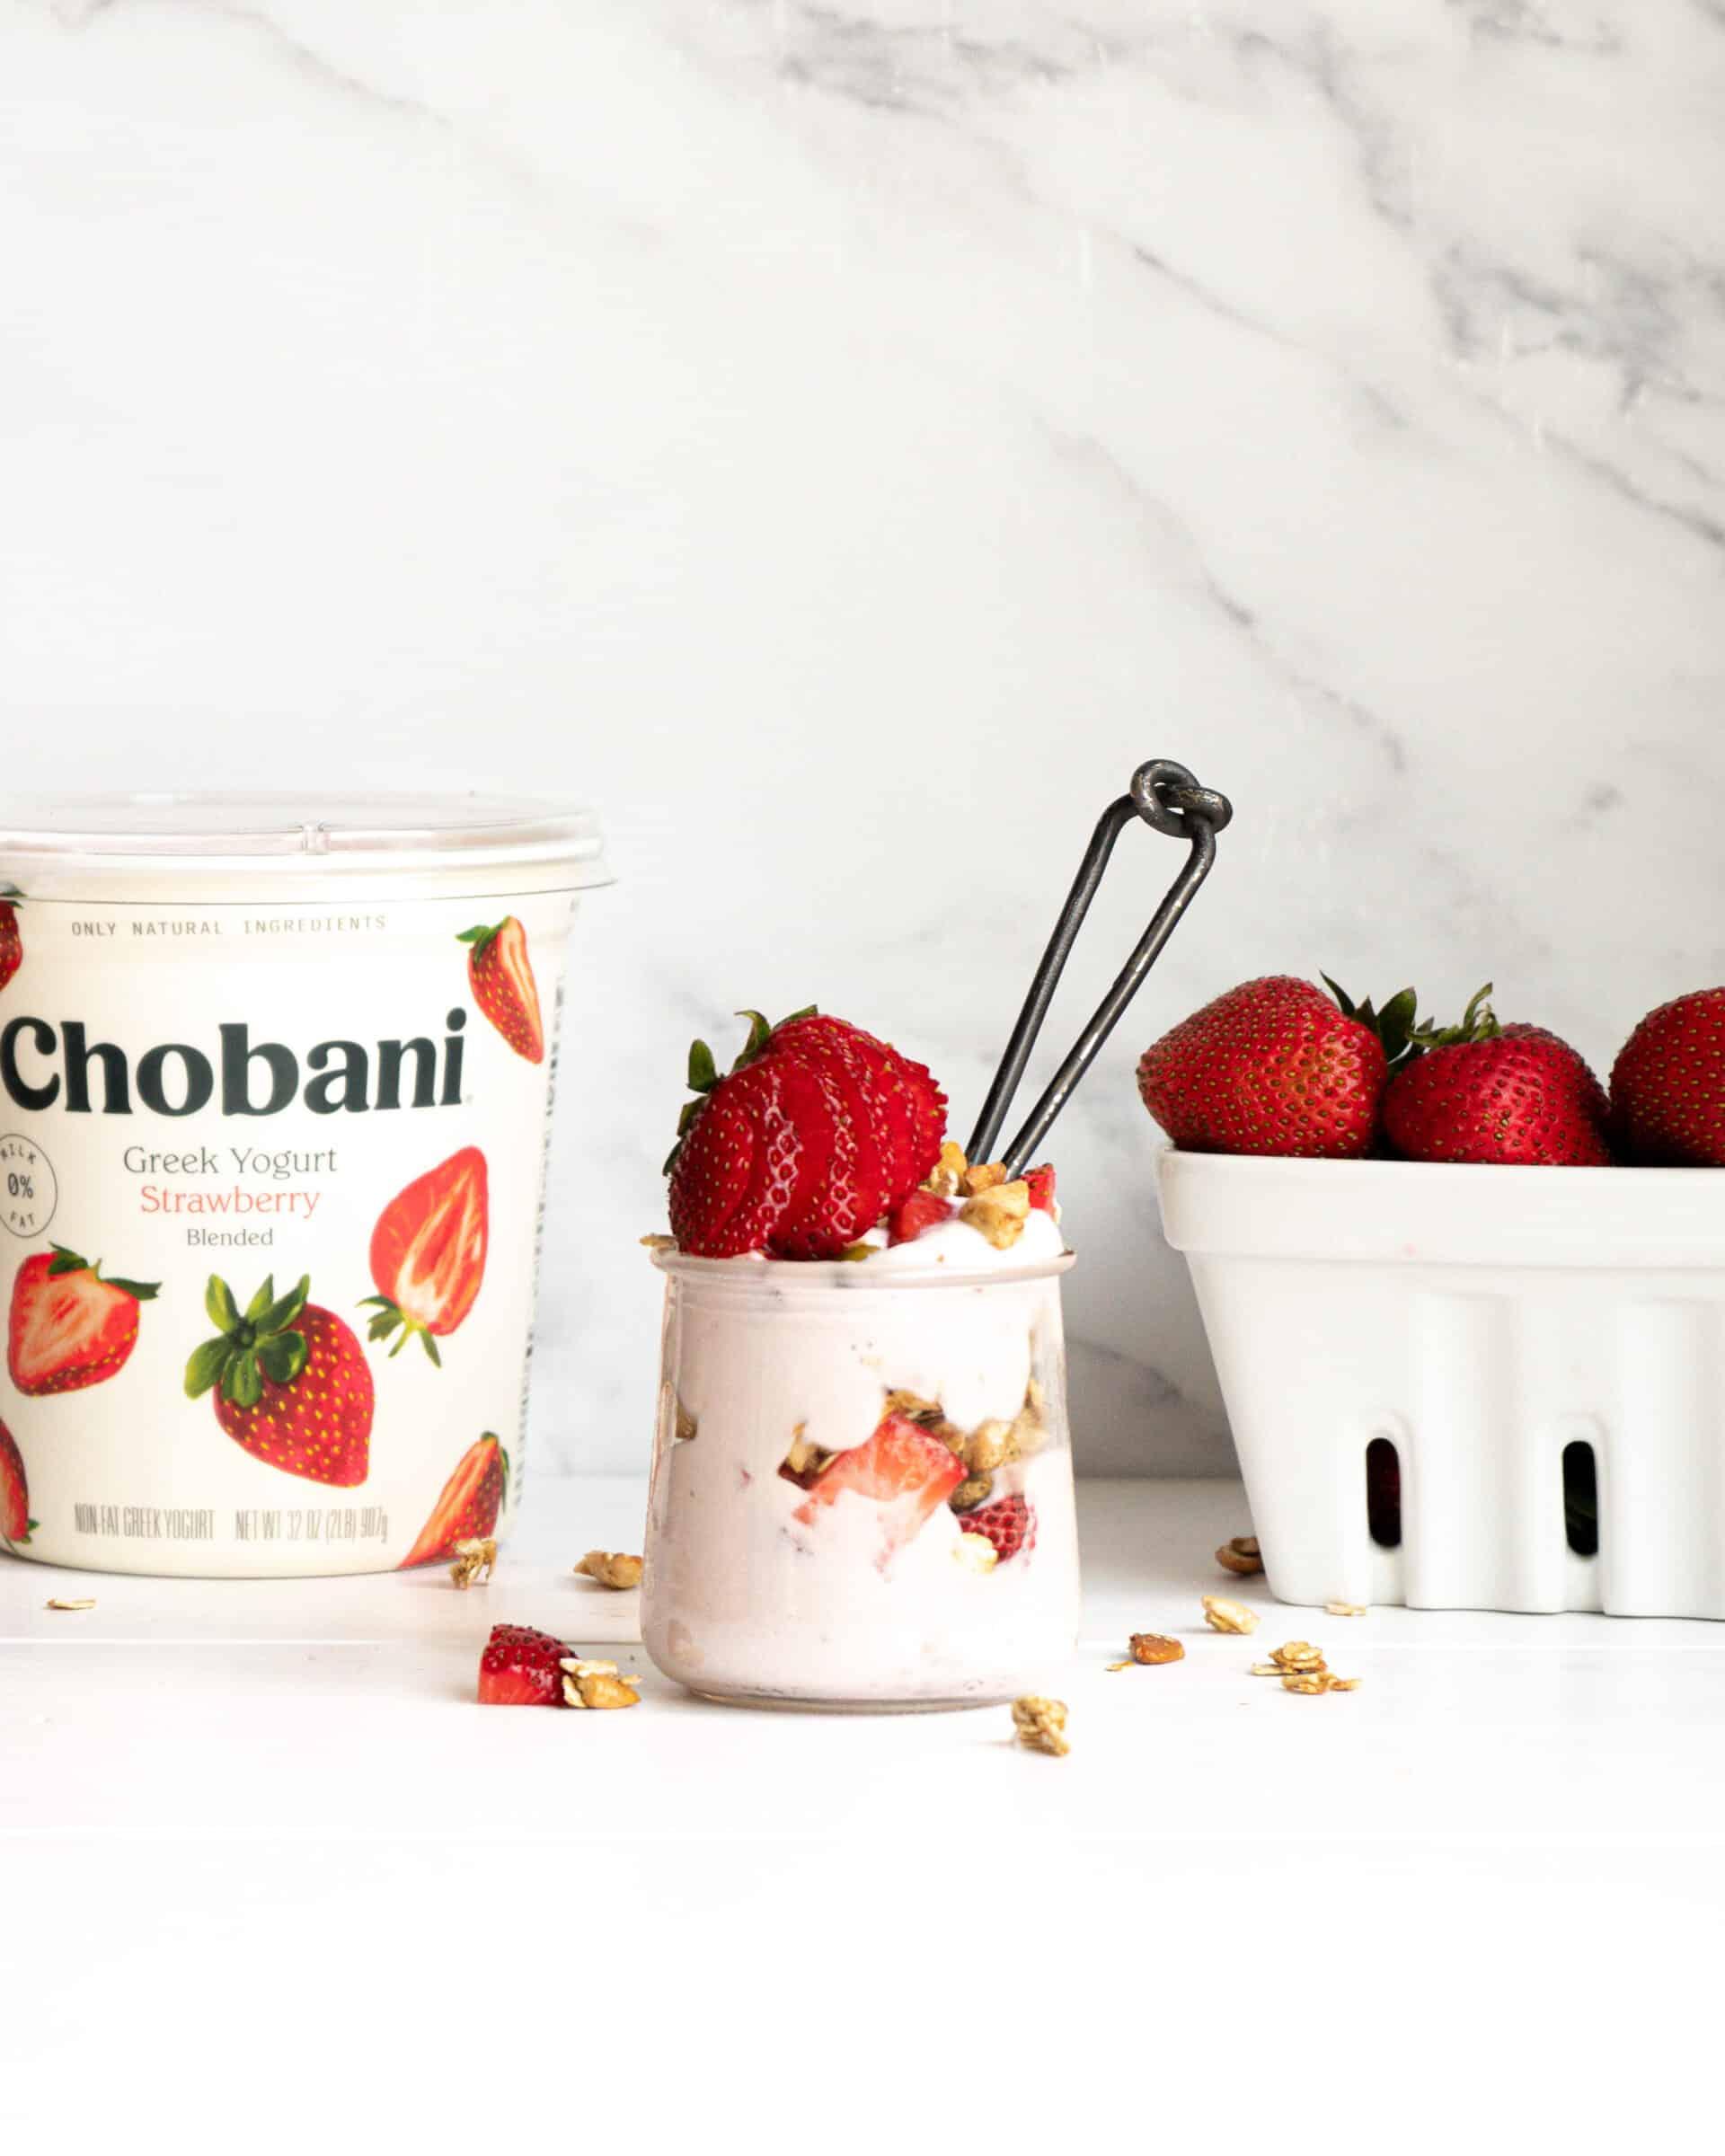 A parfait made with Chobani strawberry yogurt, granola and strawberries.